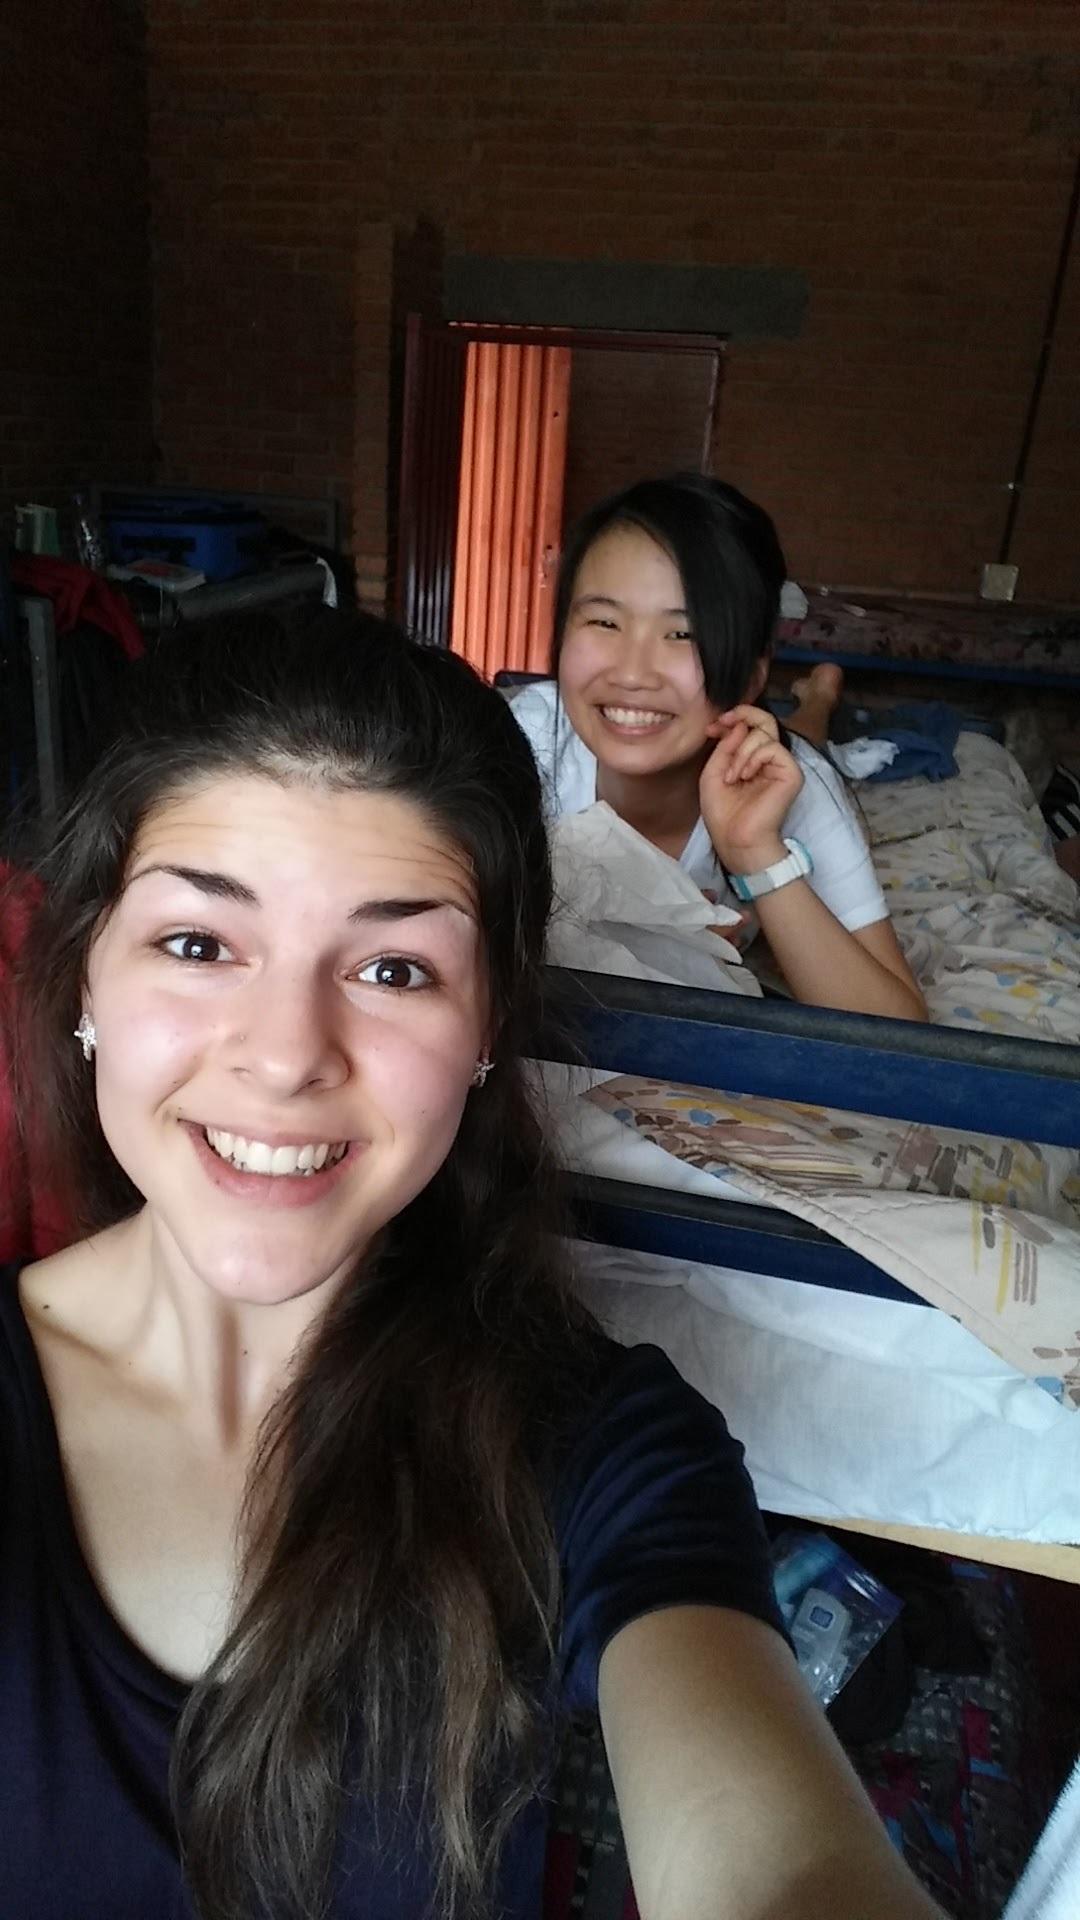 Roommates!